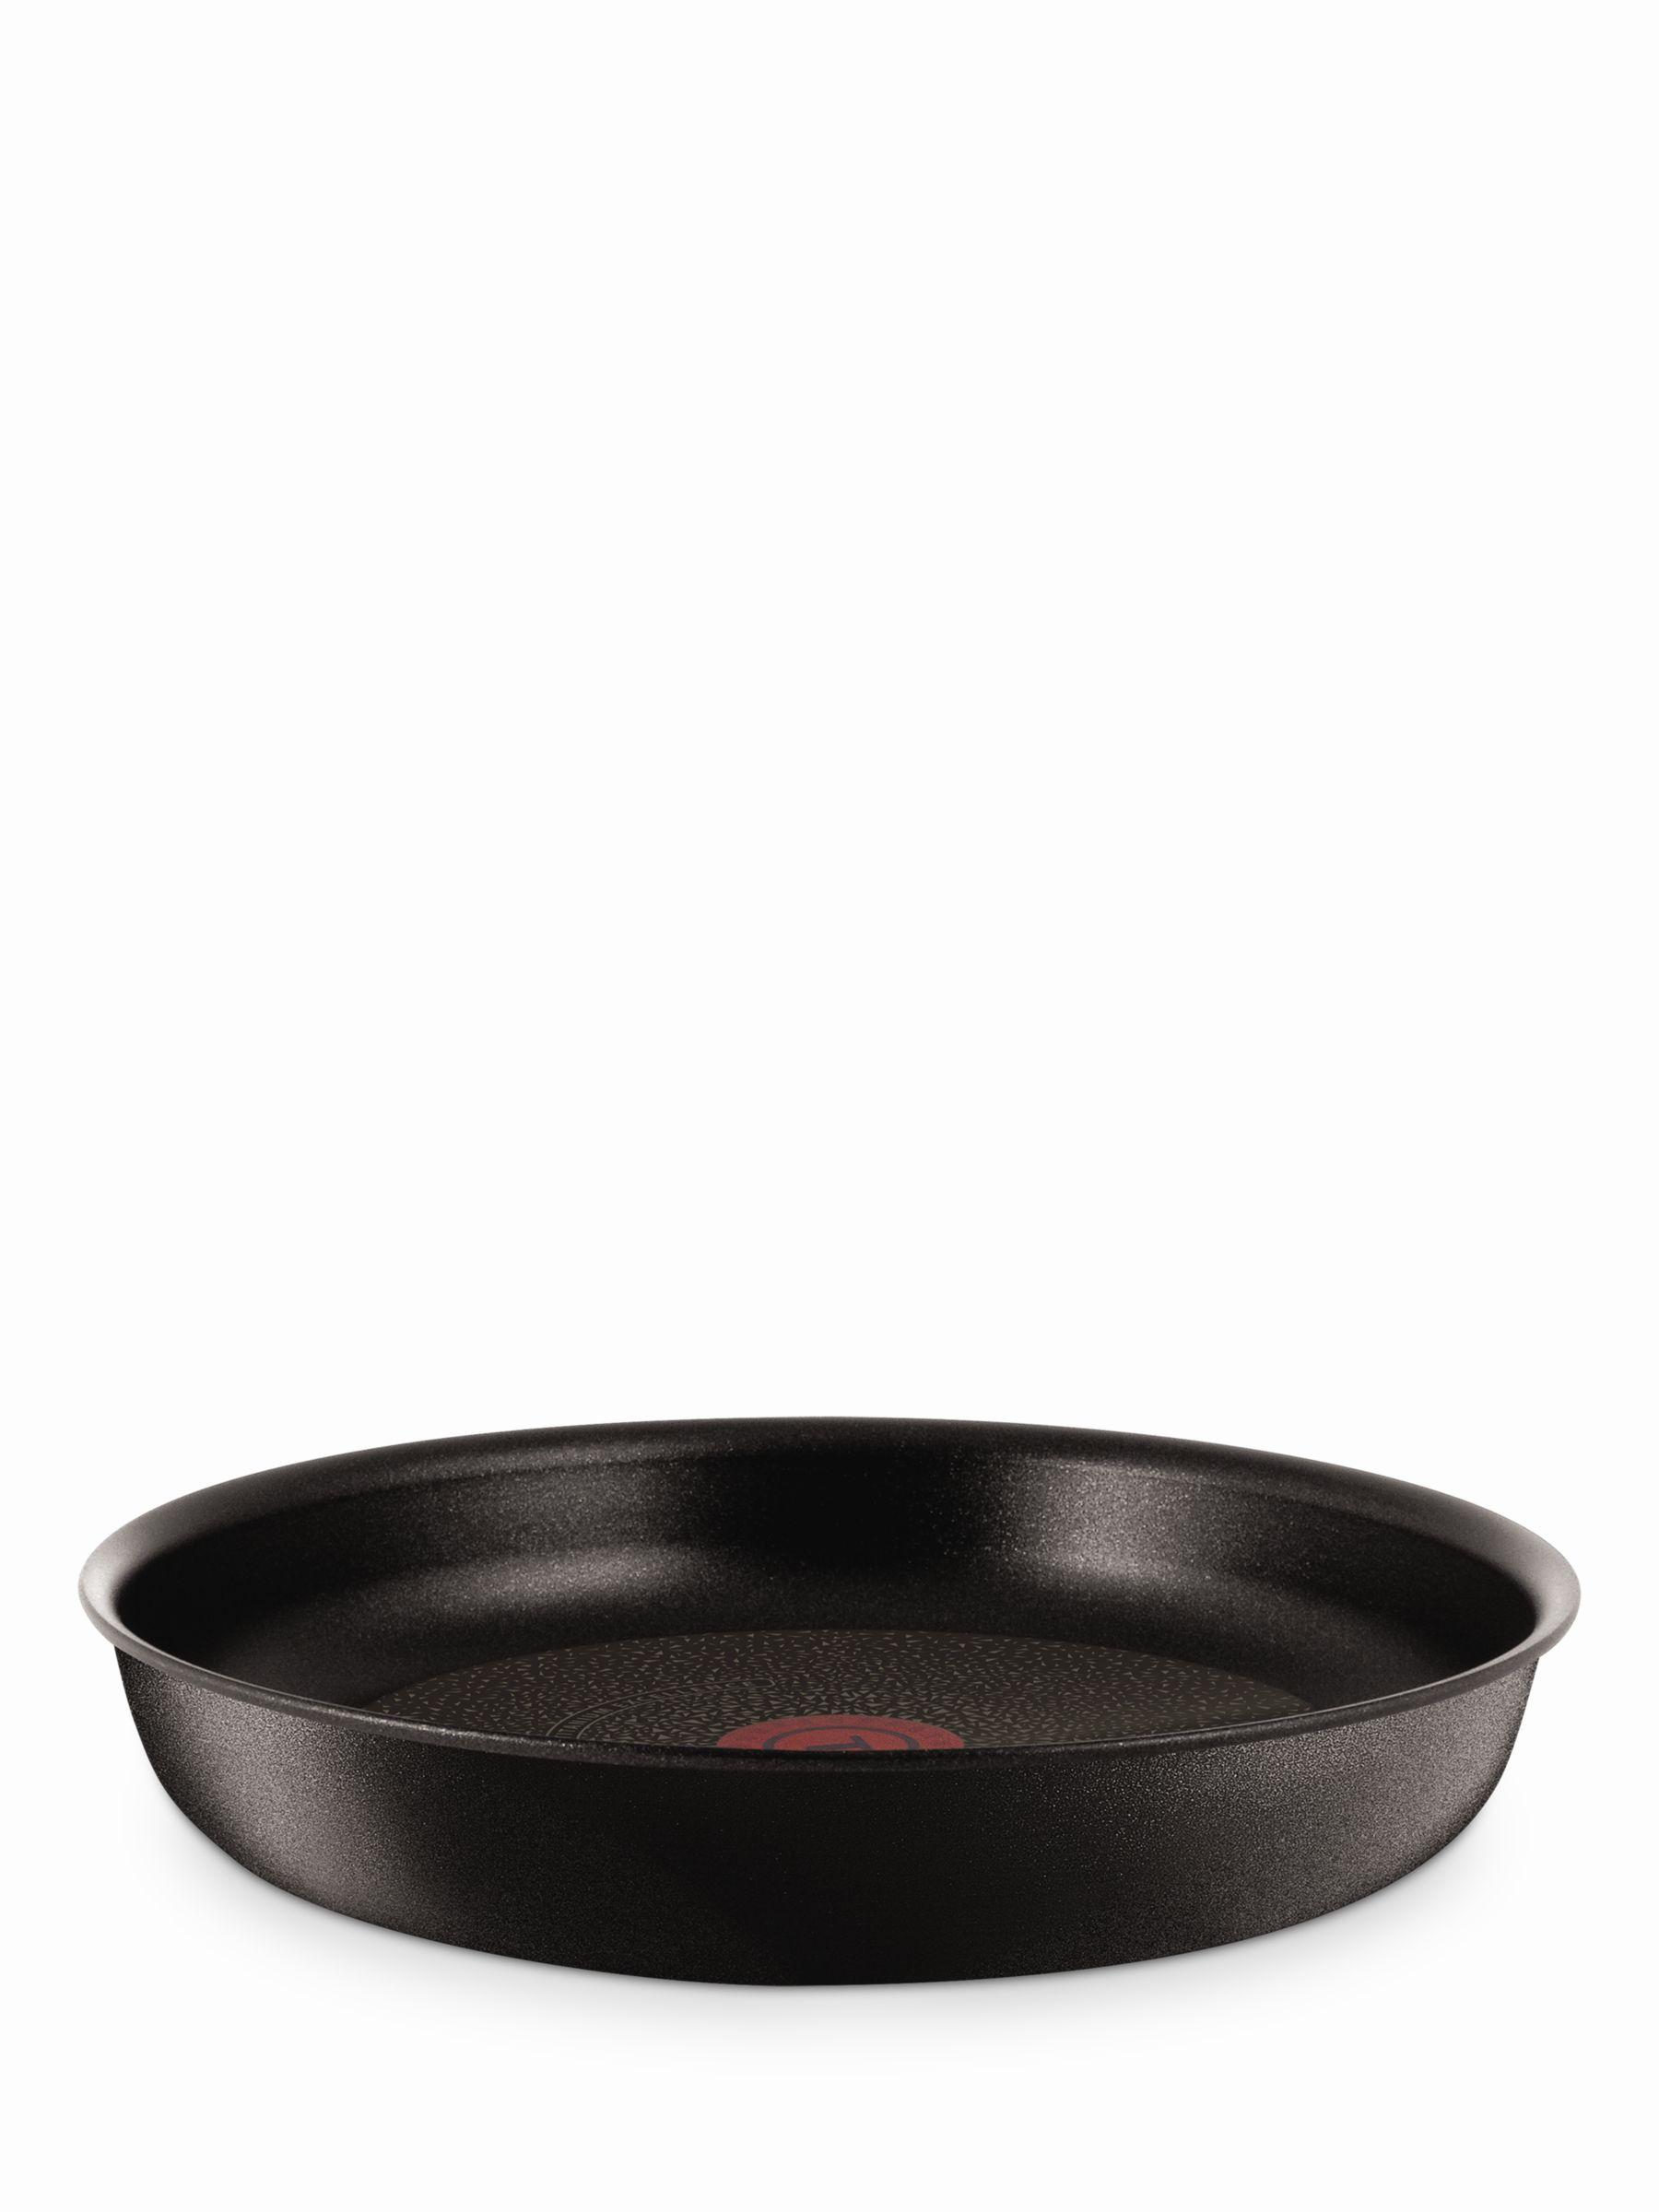 Tefal Ingenio Expertise Non-Stick Frying Pan, 28cm